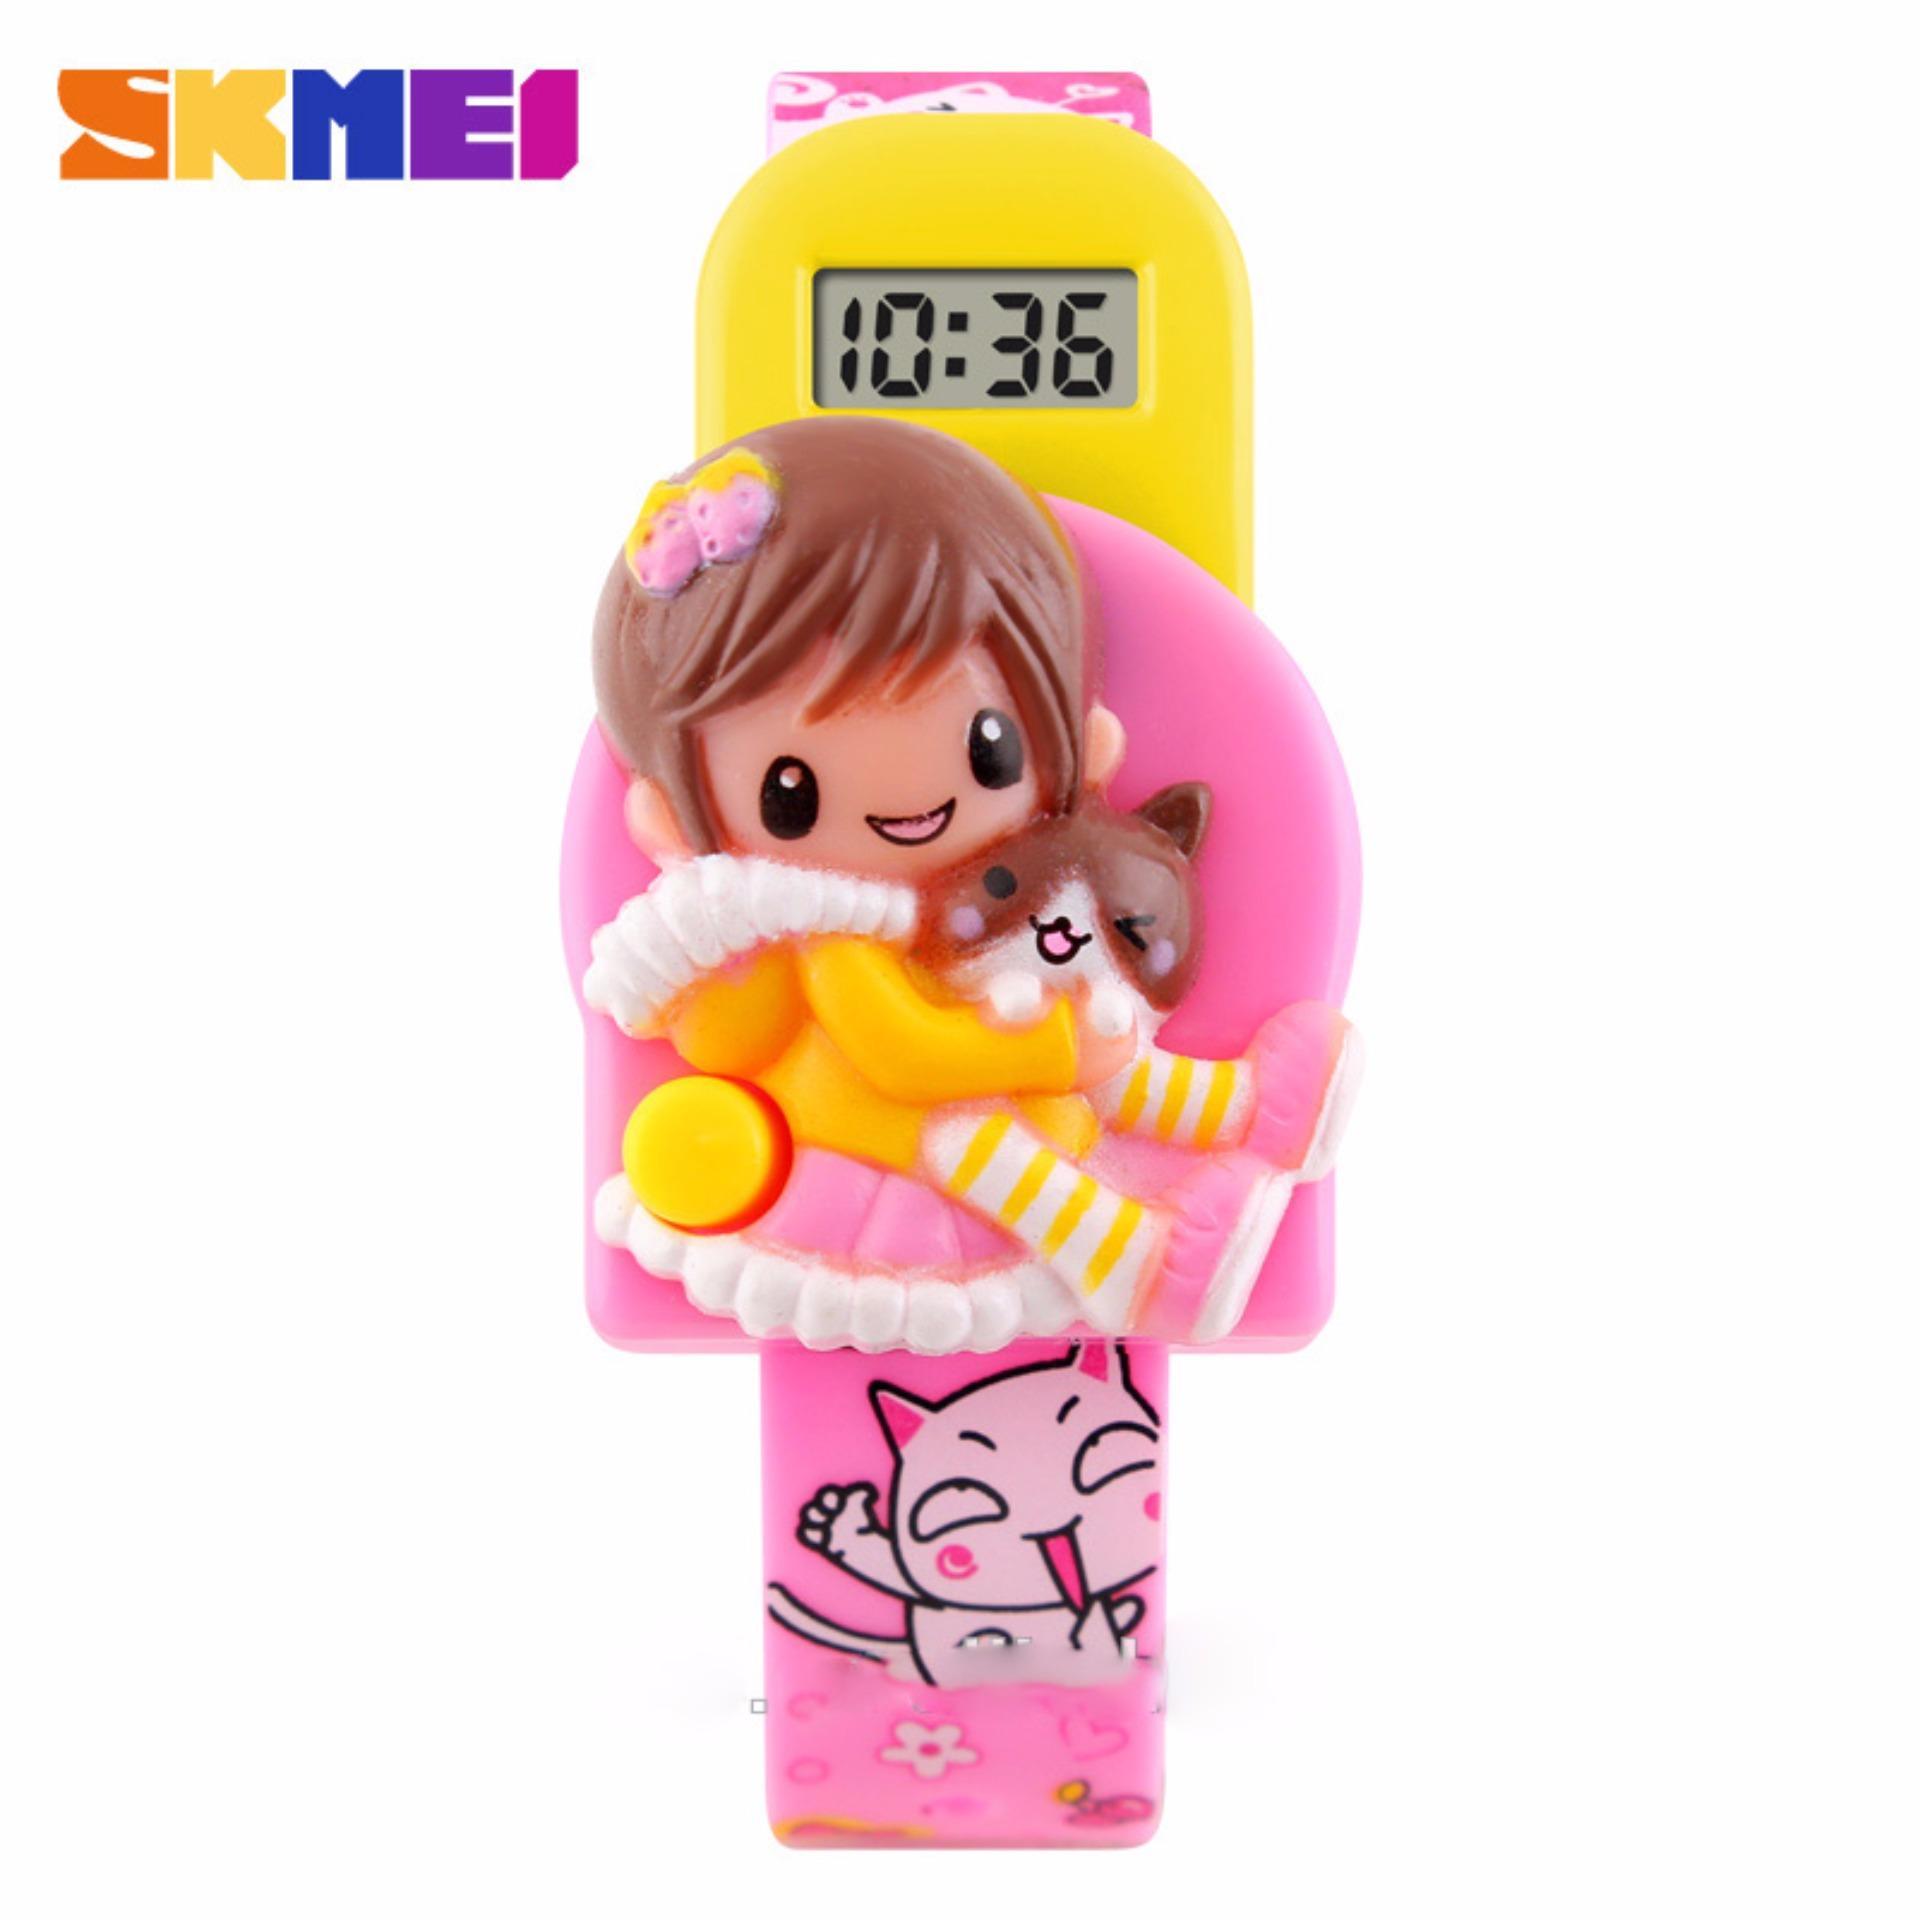 SKMEI Jam Tangan Anak Lucu Motif Boneka Jam Tangan Anak Digital DG1240 - Pink